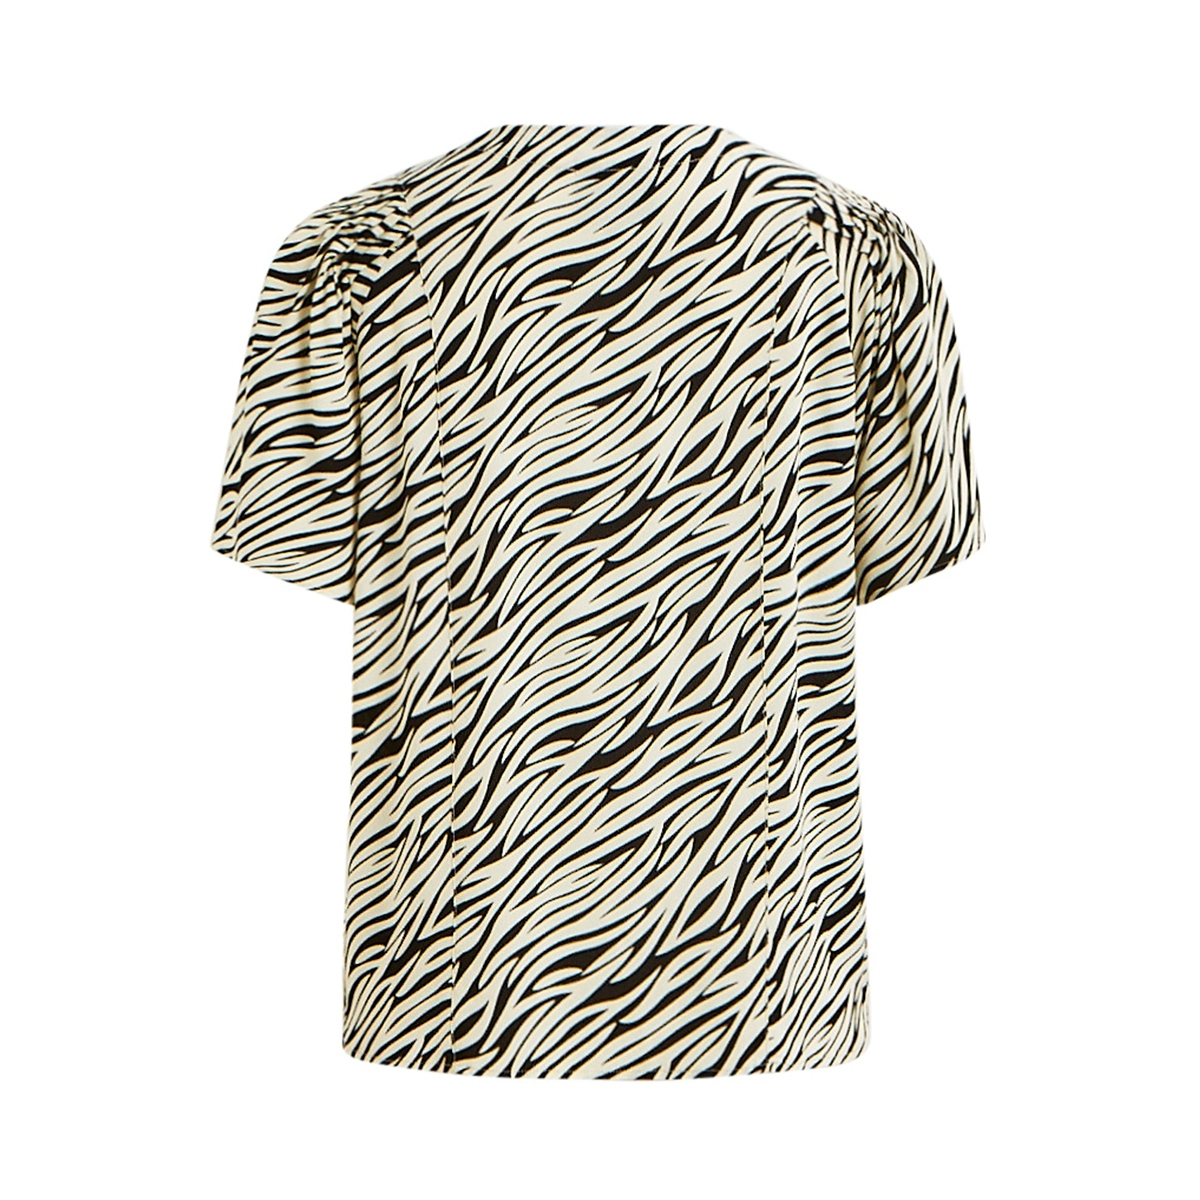 objbonnie 2/4 top pb7 23031716 object blouse black/zebra